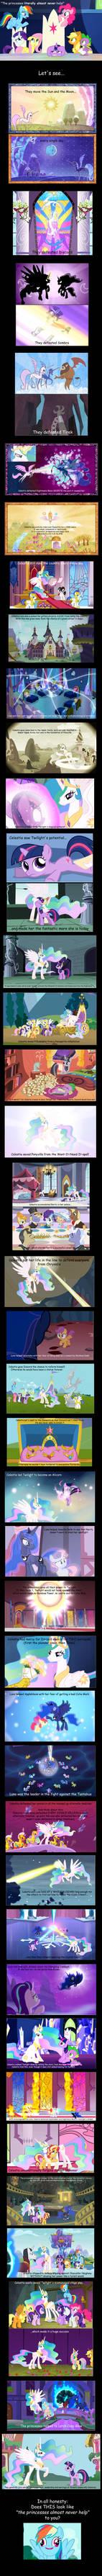 The Princesses Never Help